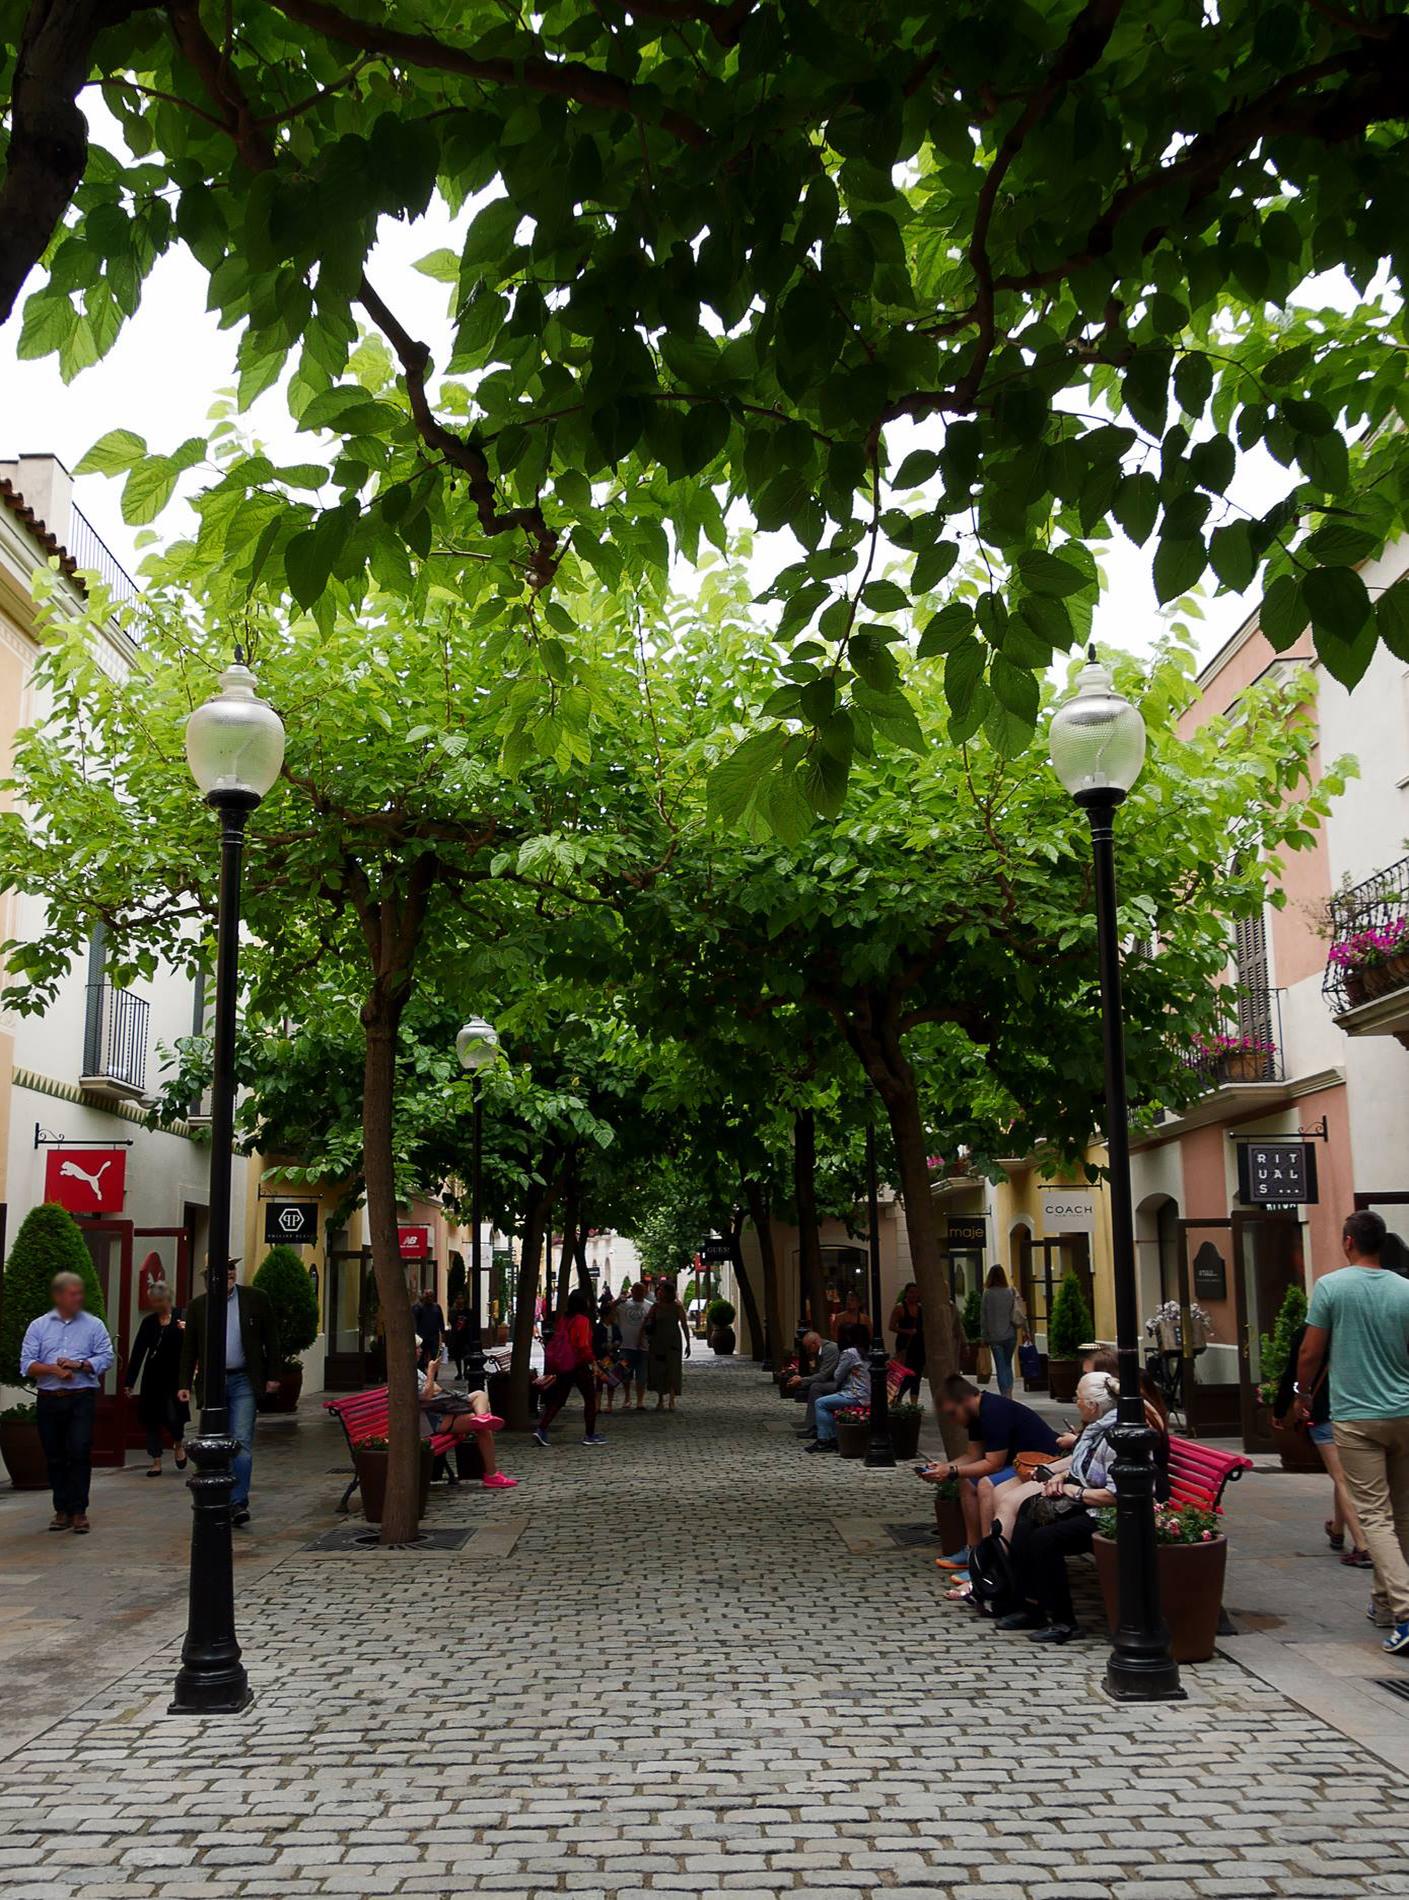 La roca village barcelone extérieur 1 - juliesliberties